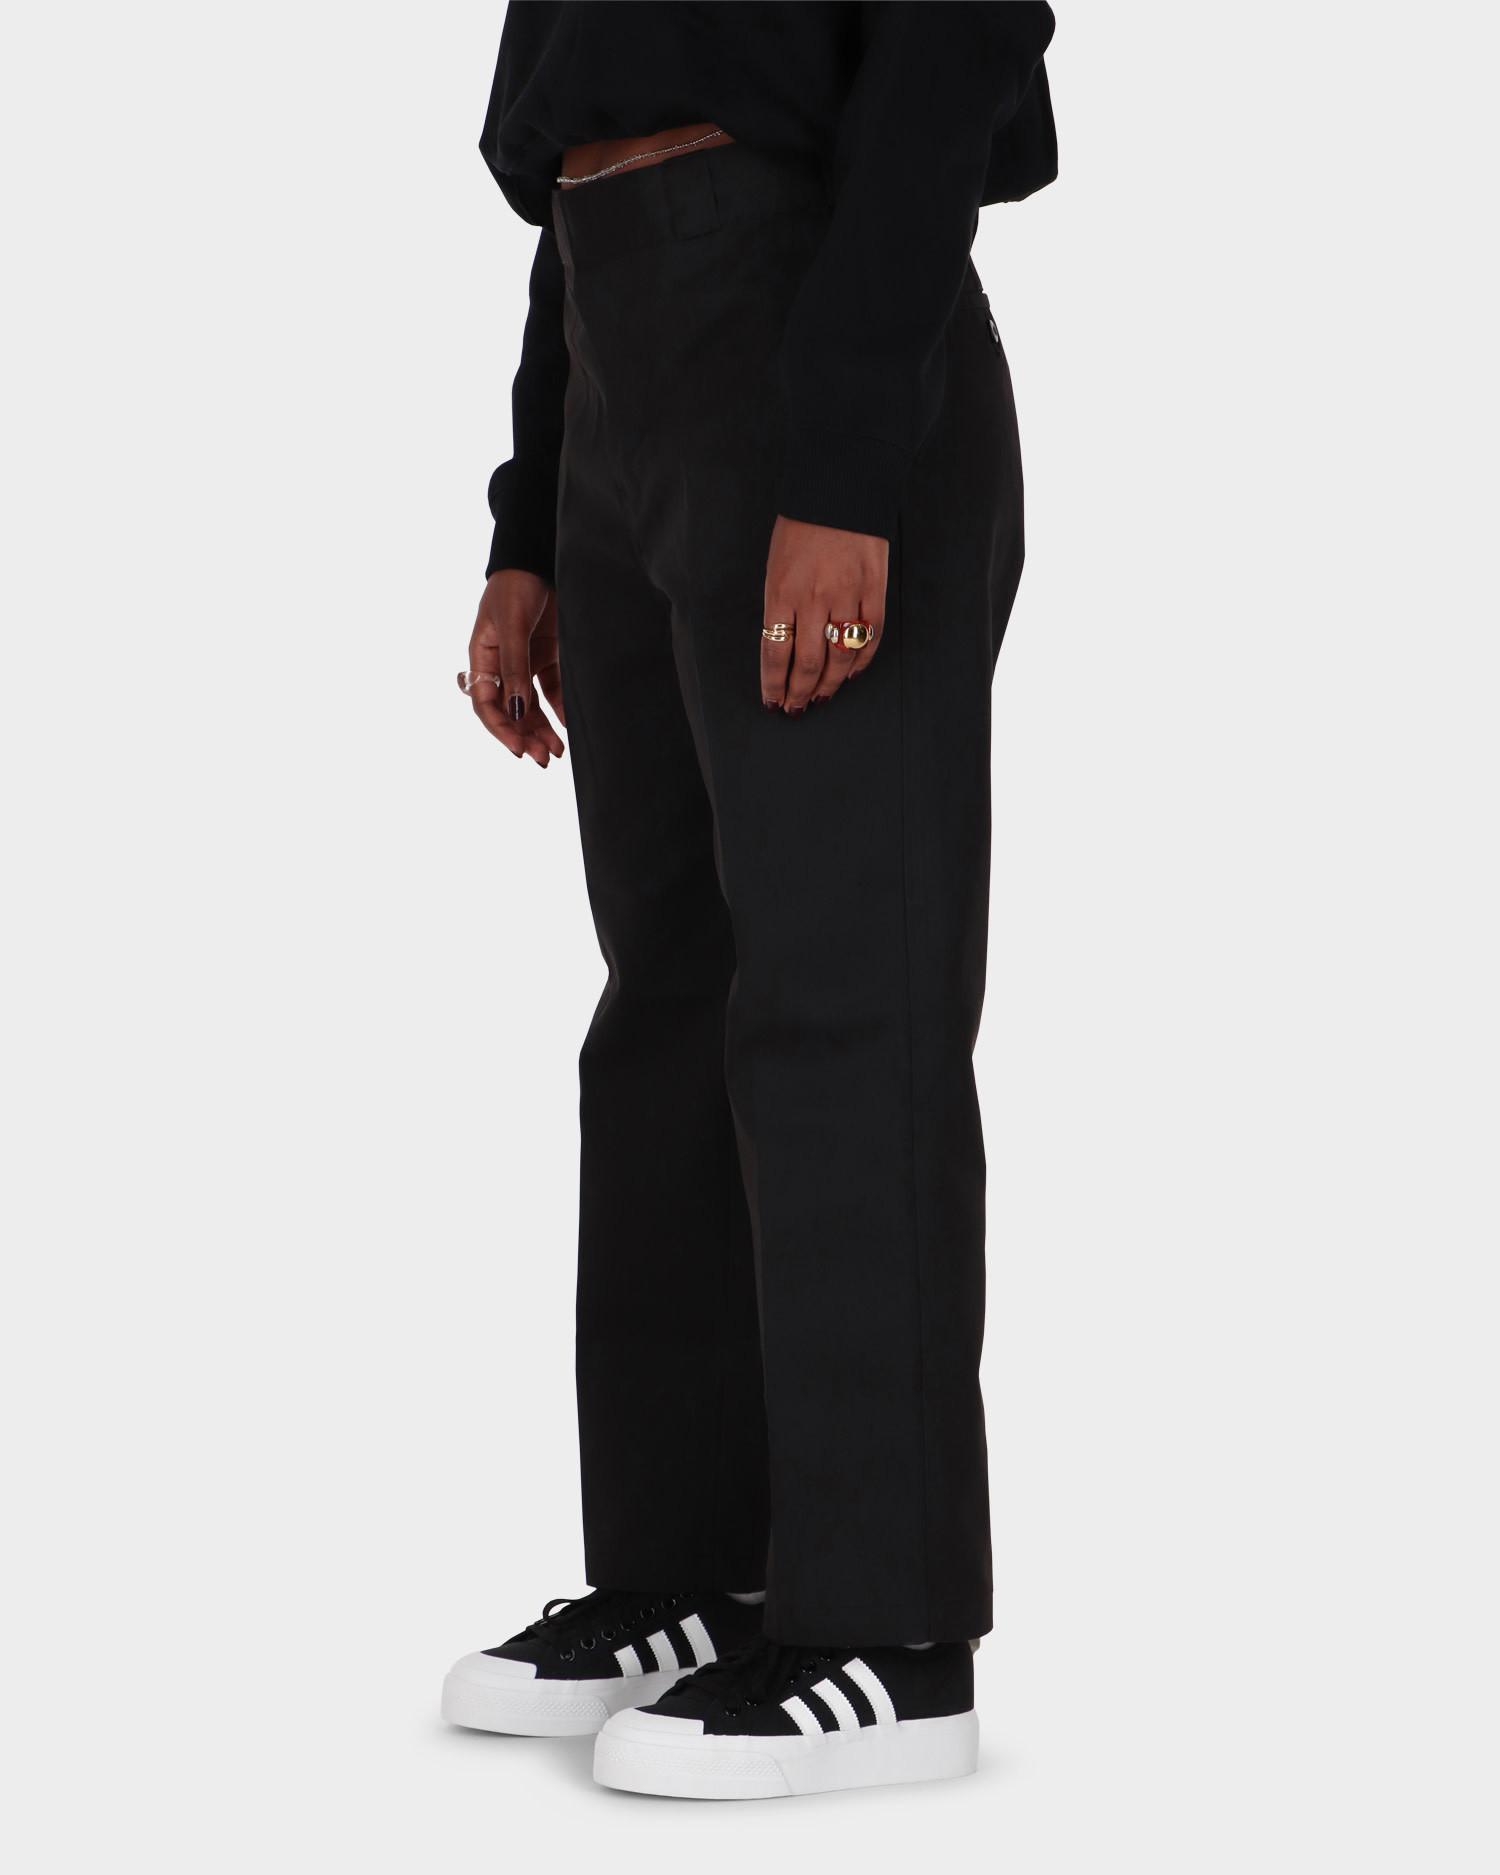 Dickies Original 874 W Cropped Pant Black